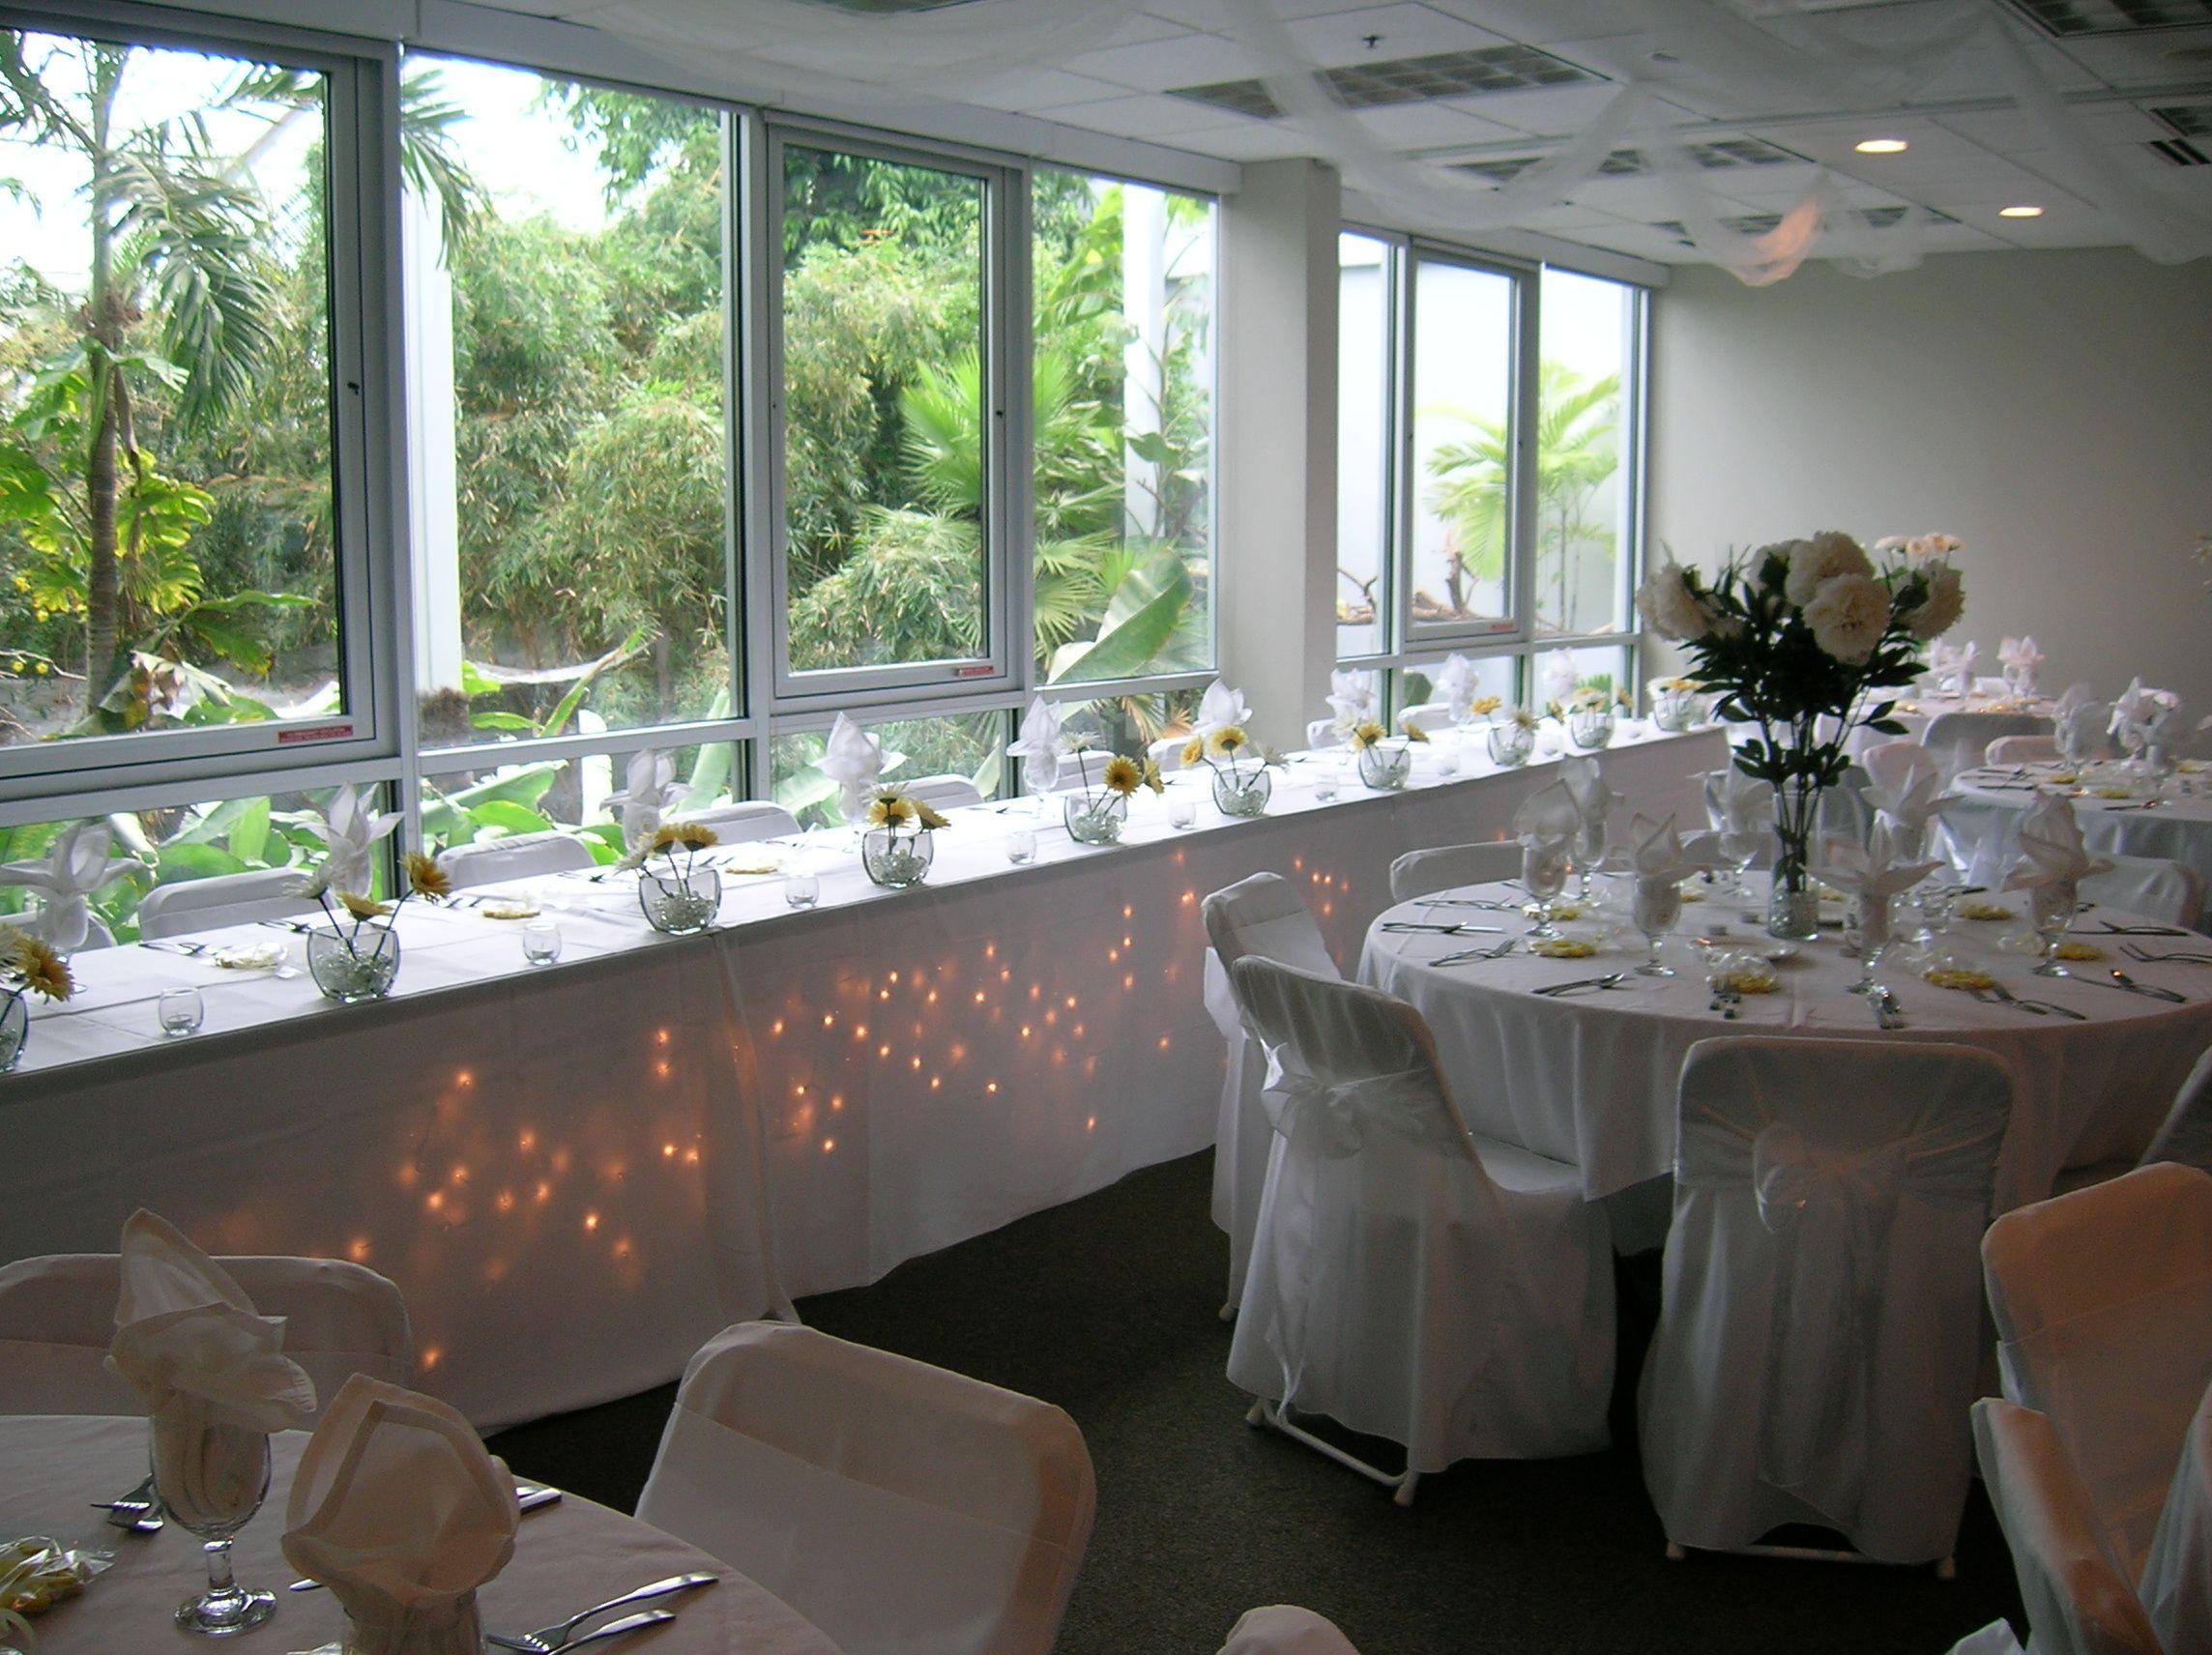 Blank Park Zoo Des Moines Myiowawedding Wedding Rentals Blank Park Zoo Best Wedding Favors